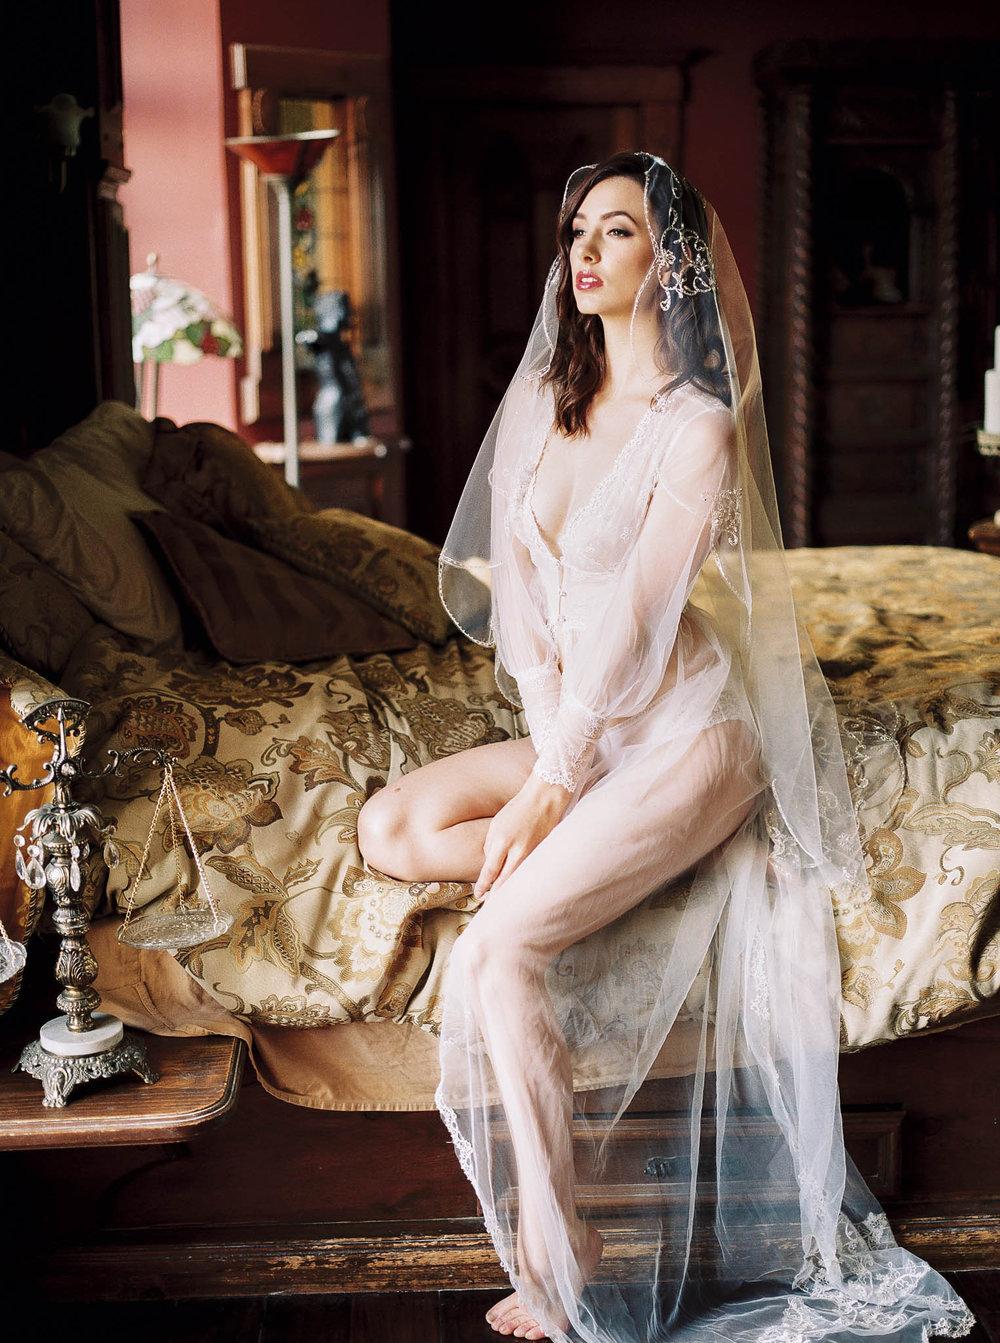 old-world-castle-wedding-inspiration-bridal-lara-lam-161.jpg